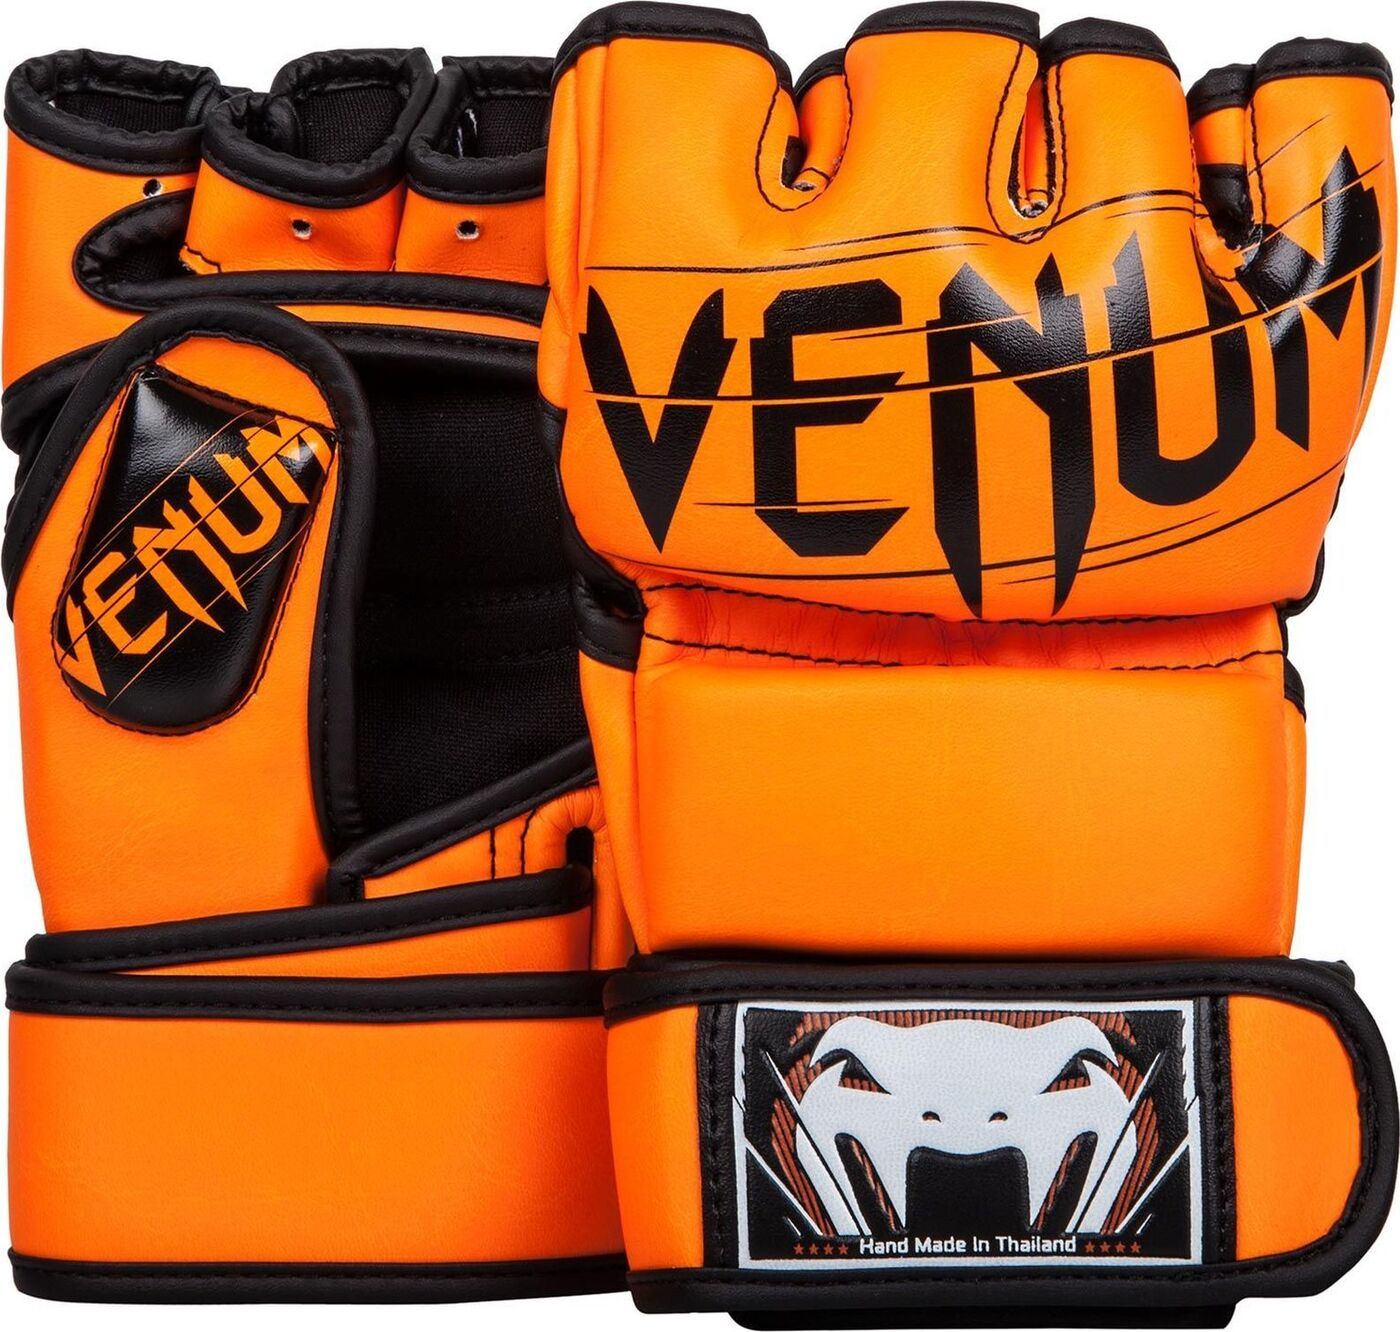 Перчатки ММА Venum Undisputed 2.0, оранжевый, размер М